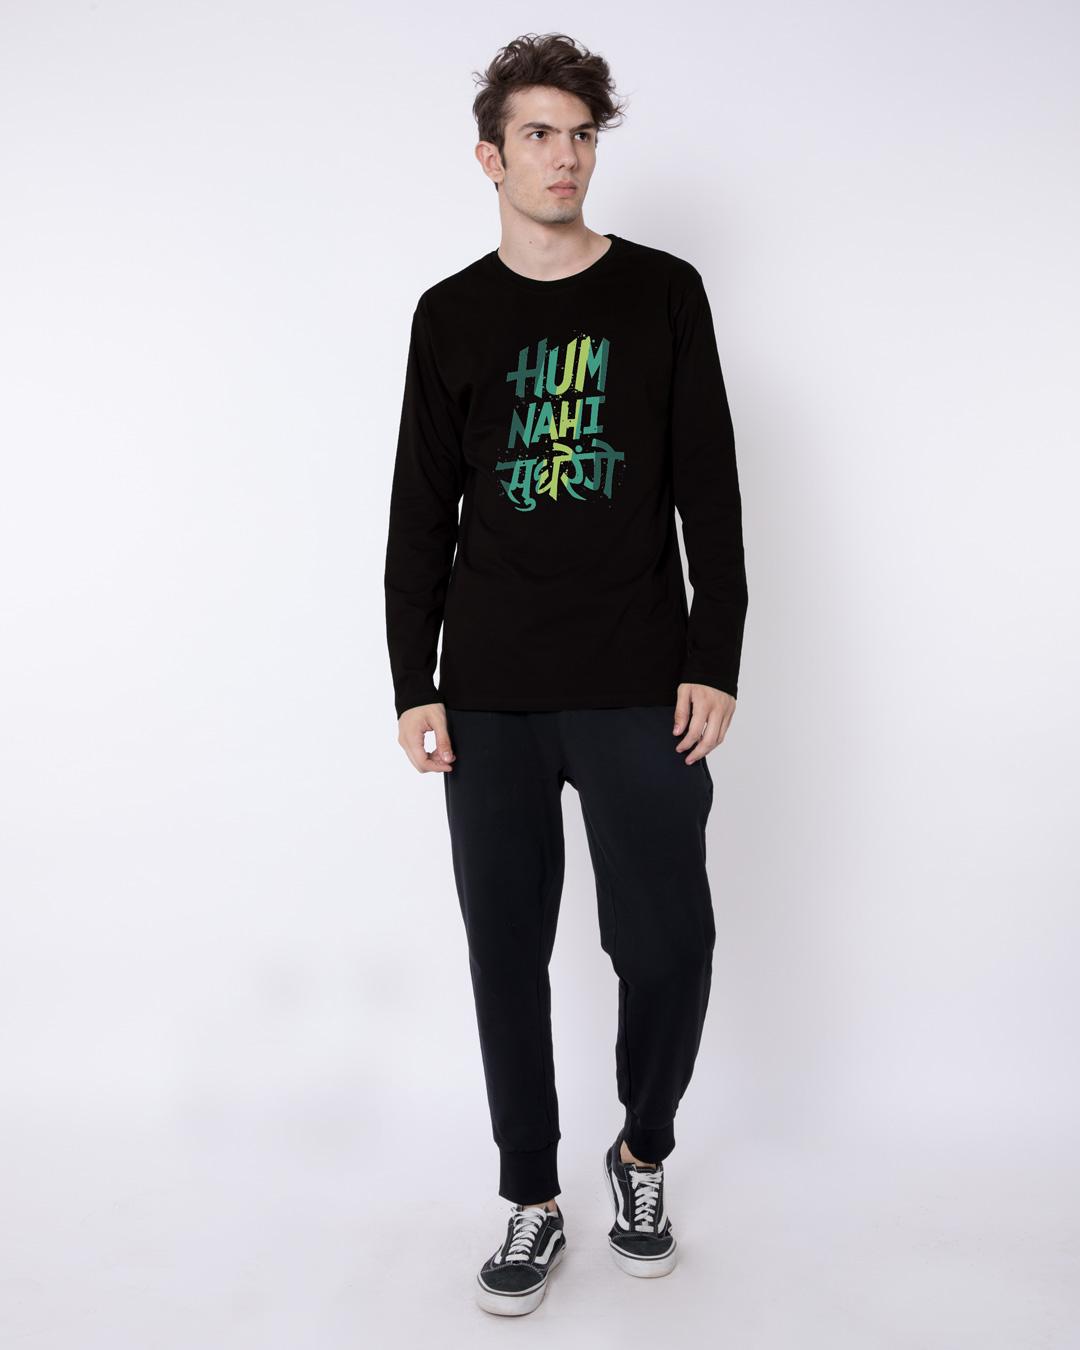 ff477fec Buy Nahi Sudhrenge Printed Full Sleeve T-Shirt For Men Online India @  Bewakoof.com